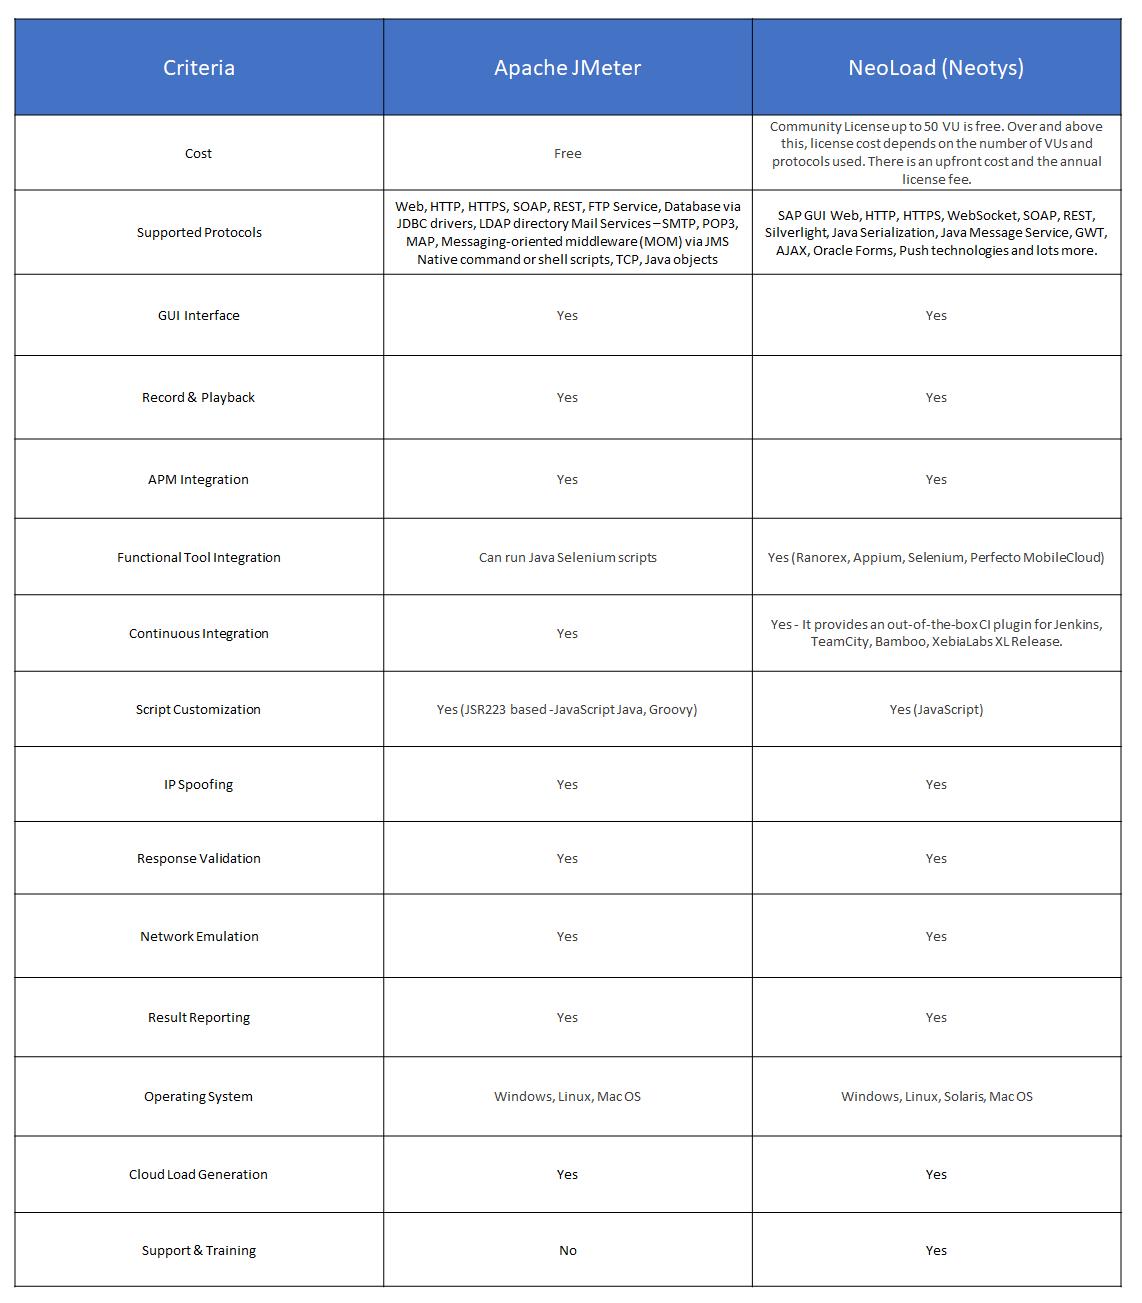 V9 Table